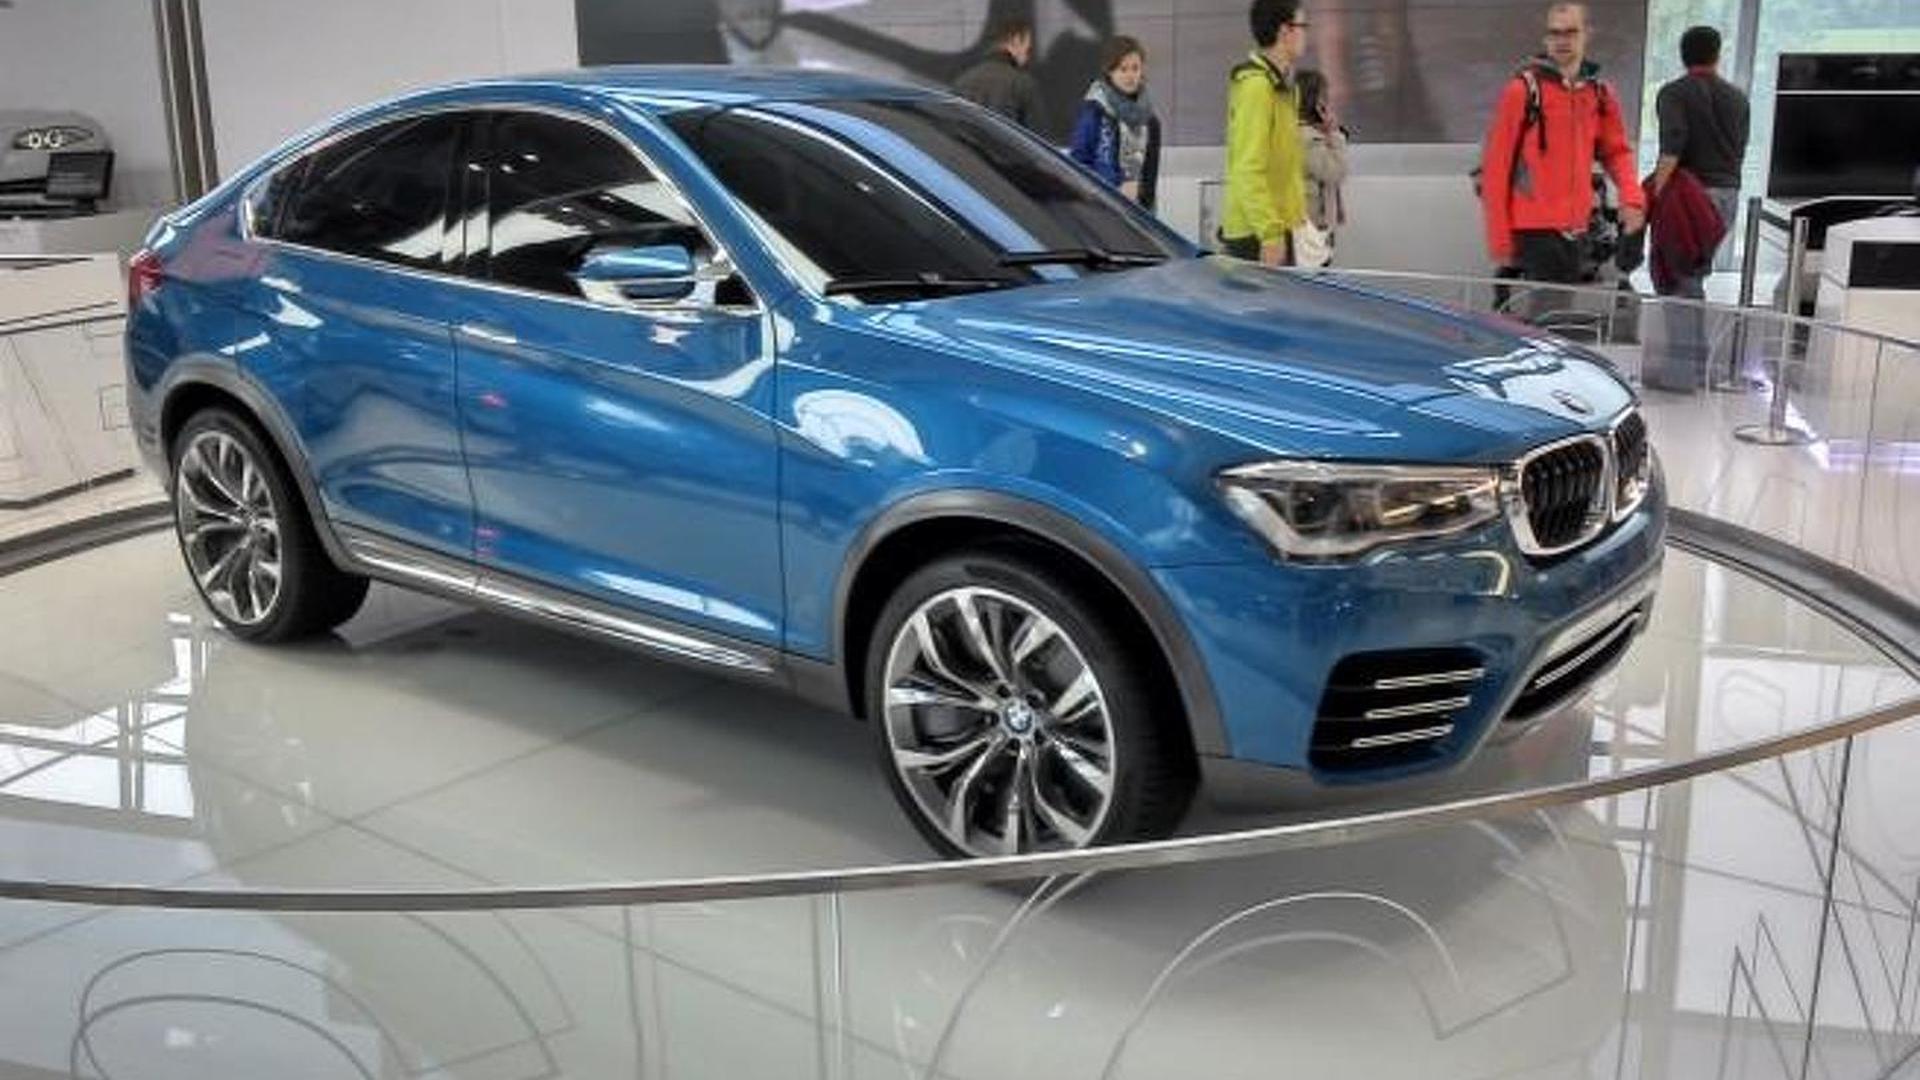 Diesel BMW X4 M Performance considered